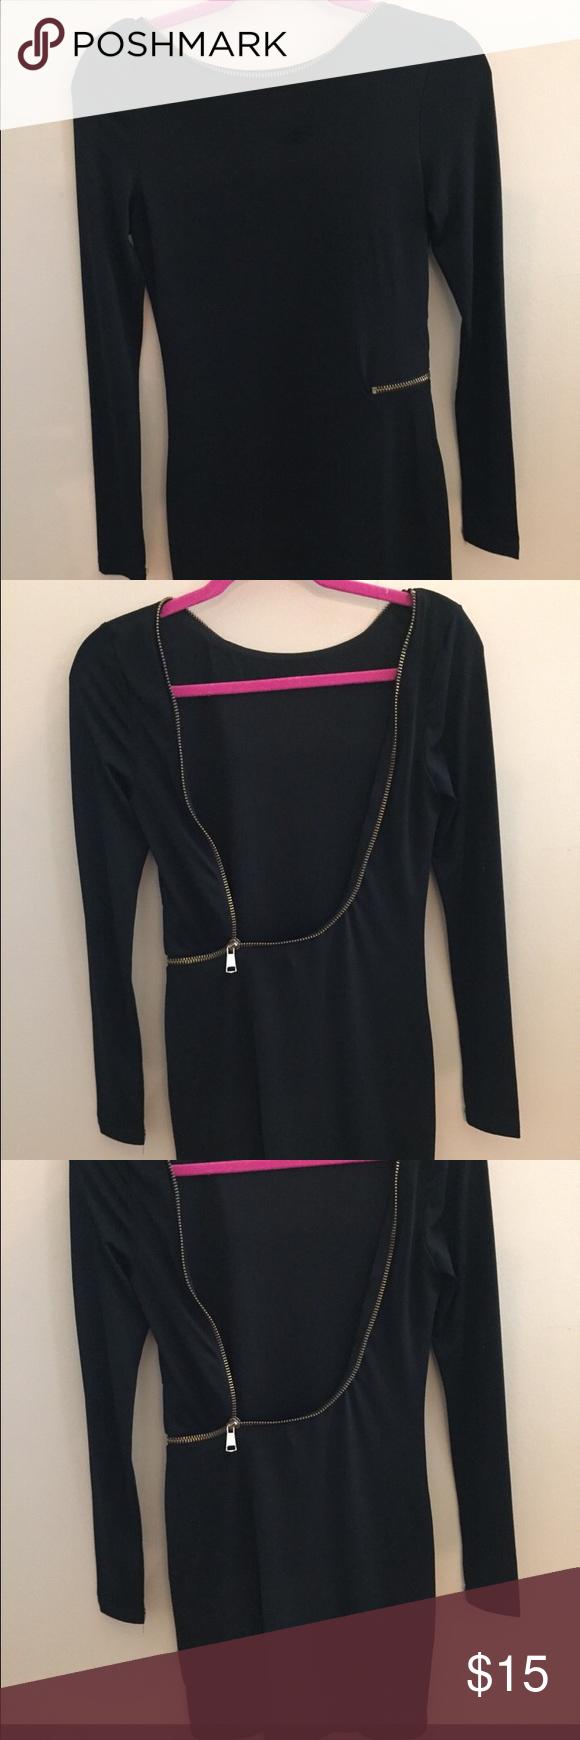 Black dress with gold zipper Cute long sleeve black dress with open back. Gold zipper Dresses Long Sleeve